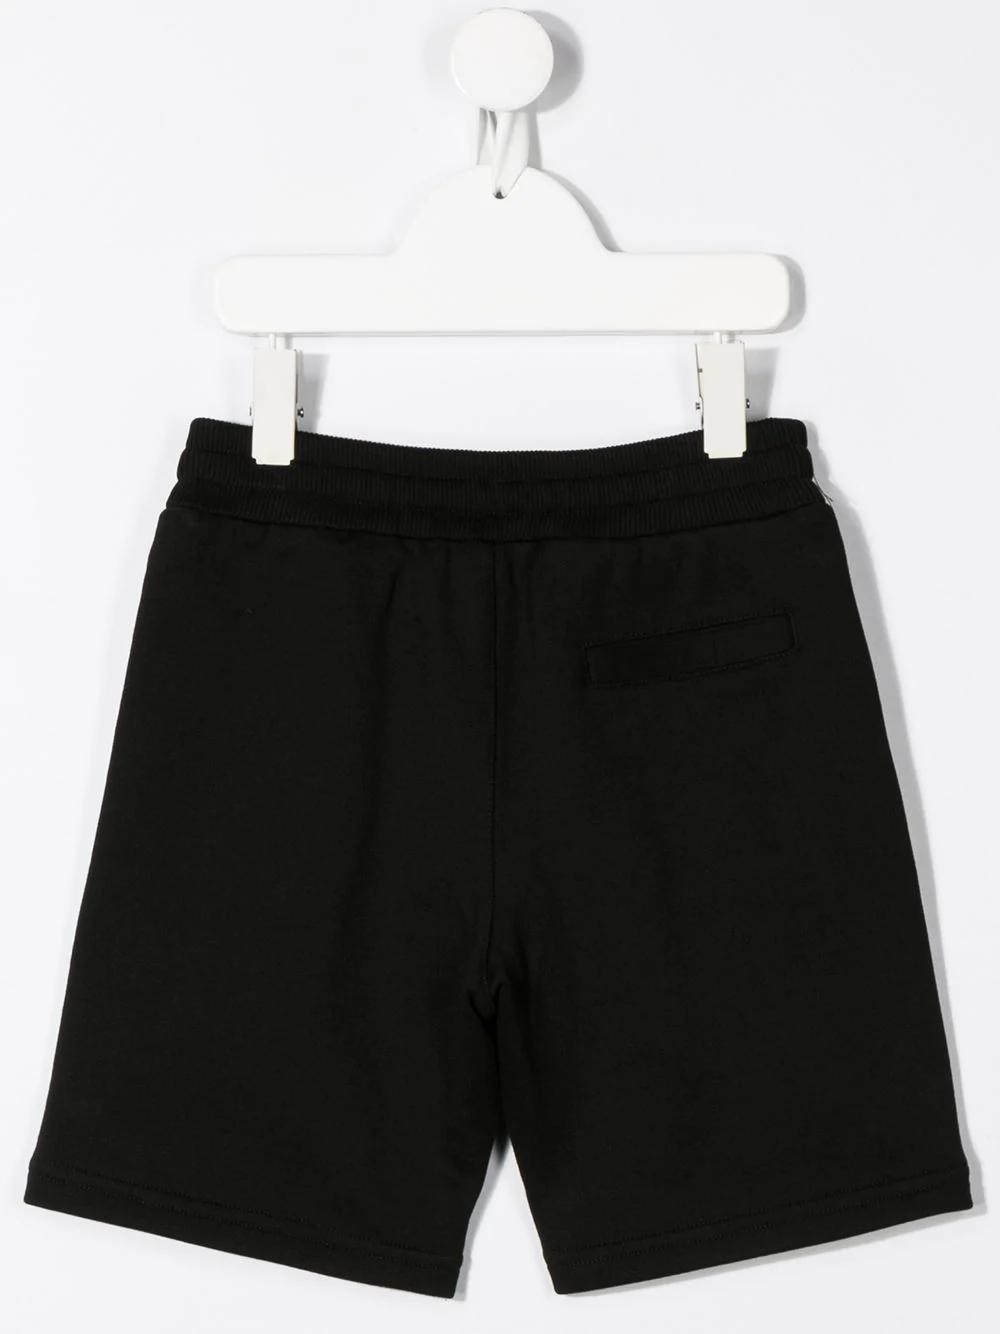 Shorts Dolce & Gabbana kids DOLCE&GABBANA KIDS | 30 | L4JQG6G7WGGN0000